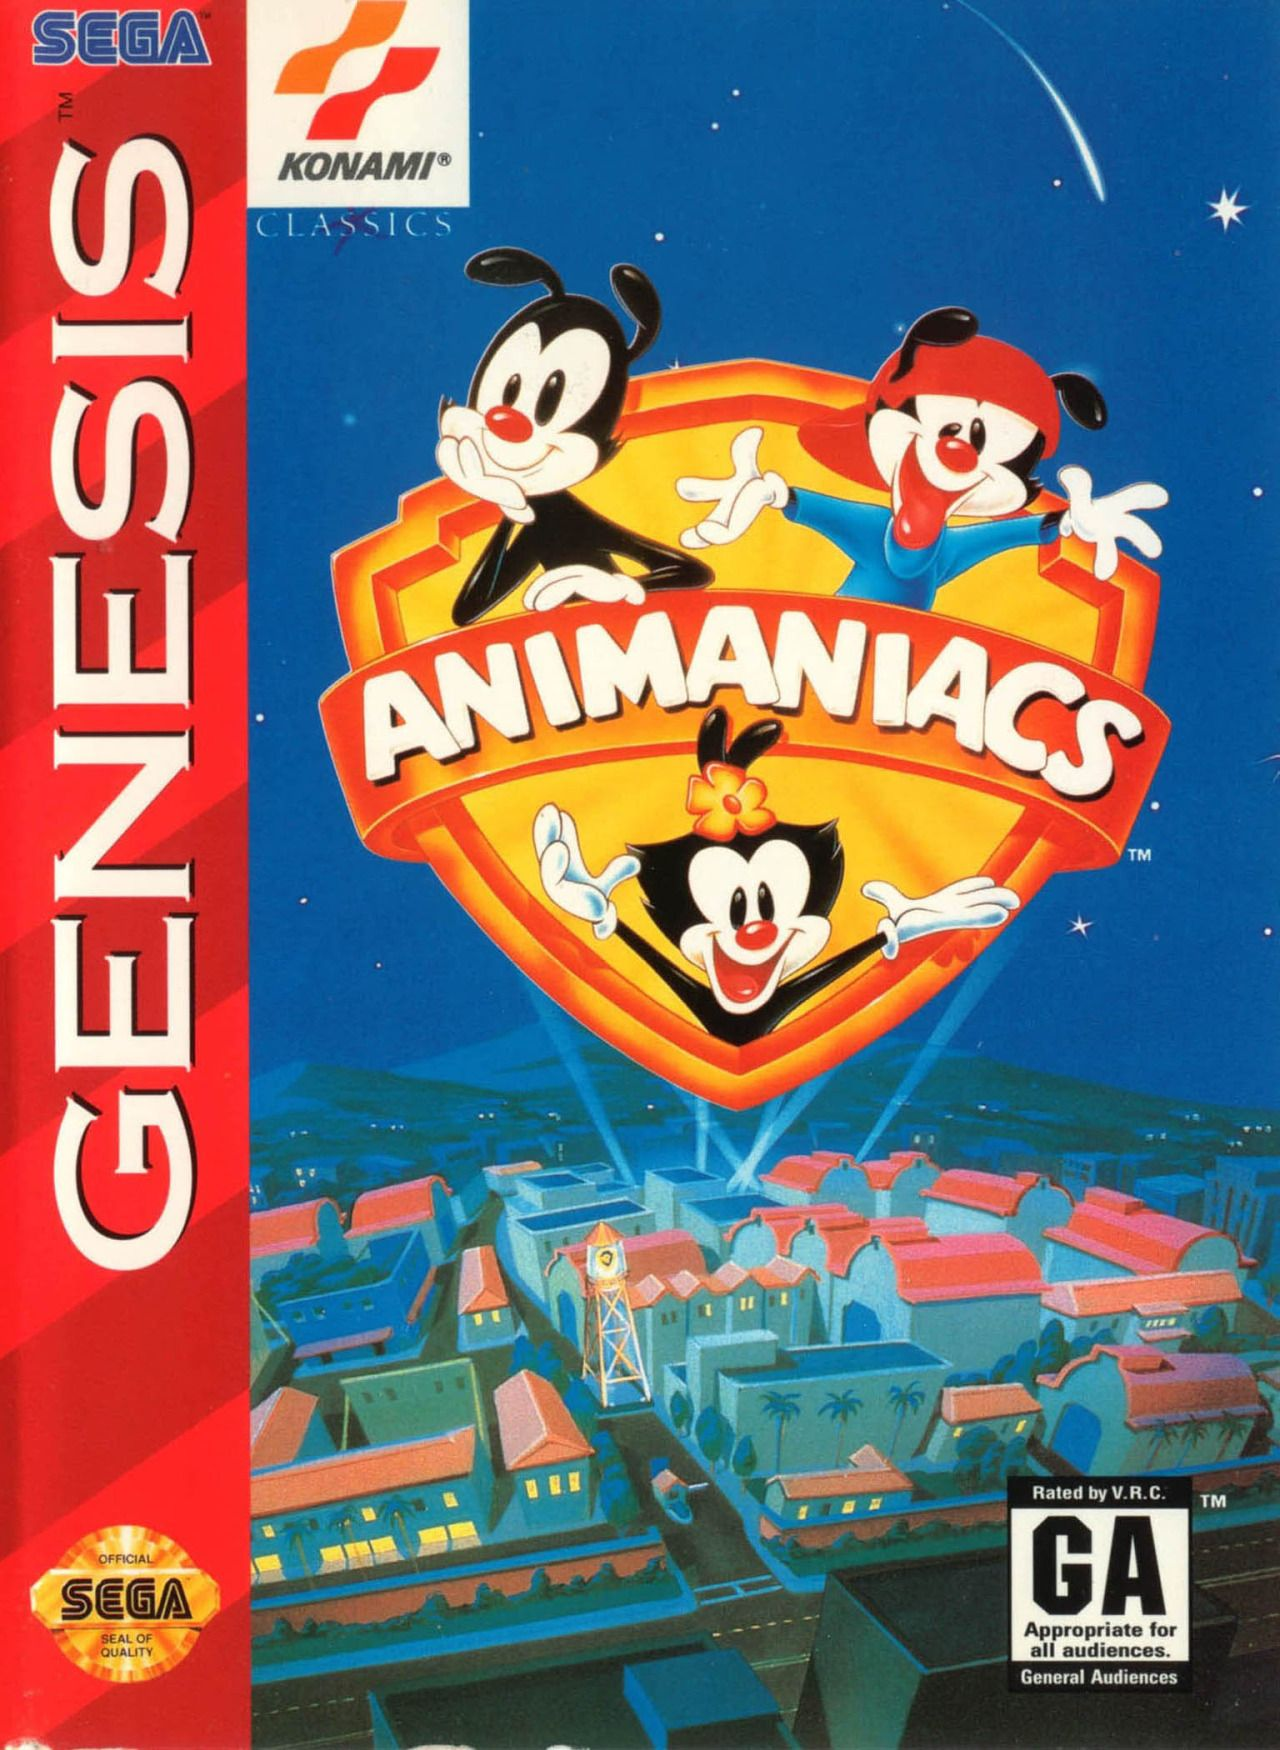 Animaniacs Sega Genesis Legendofnes Animaniacs Sega Genesis